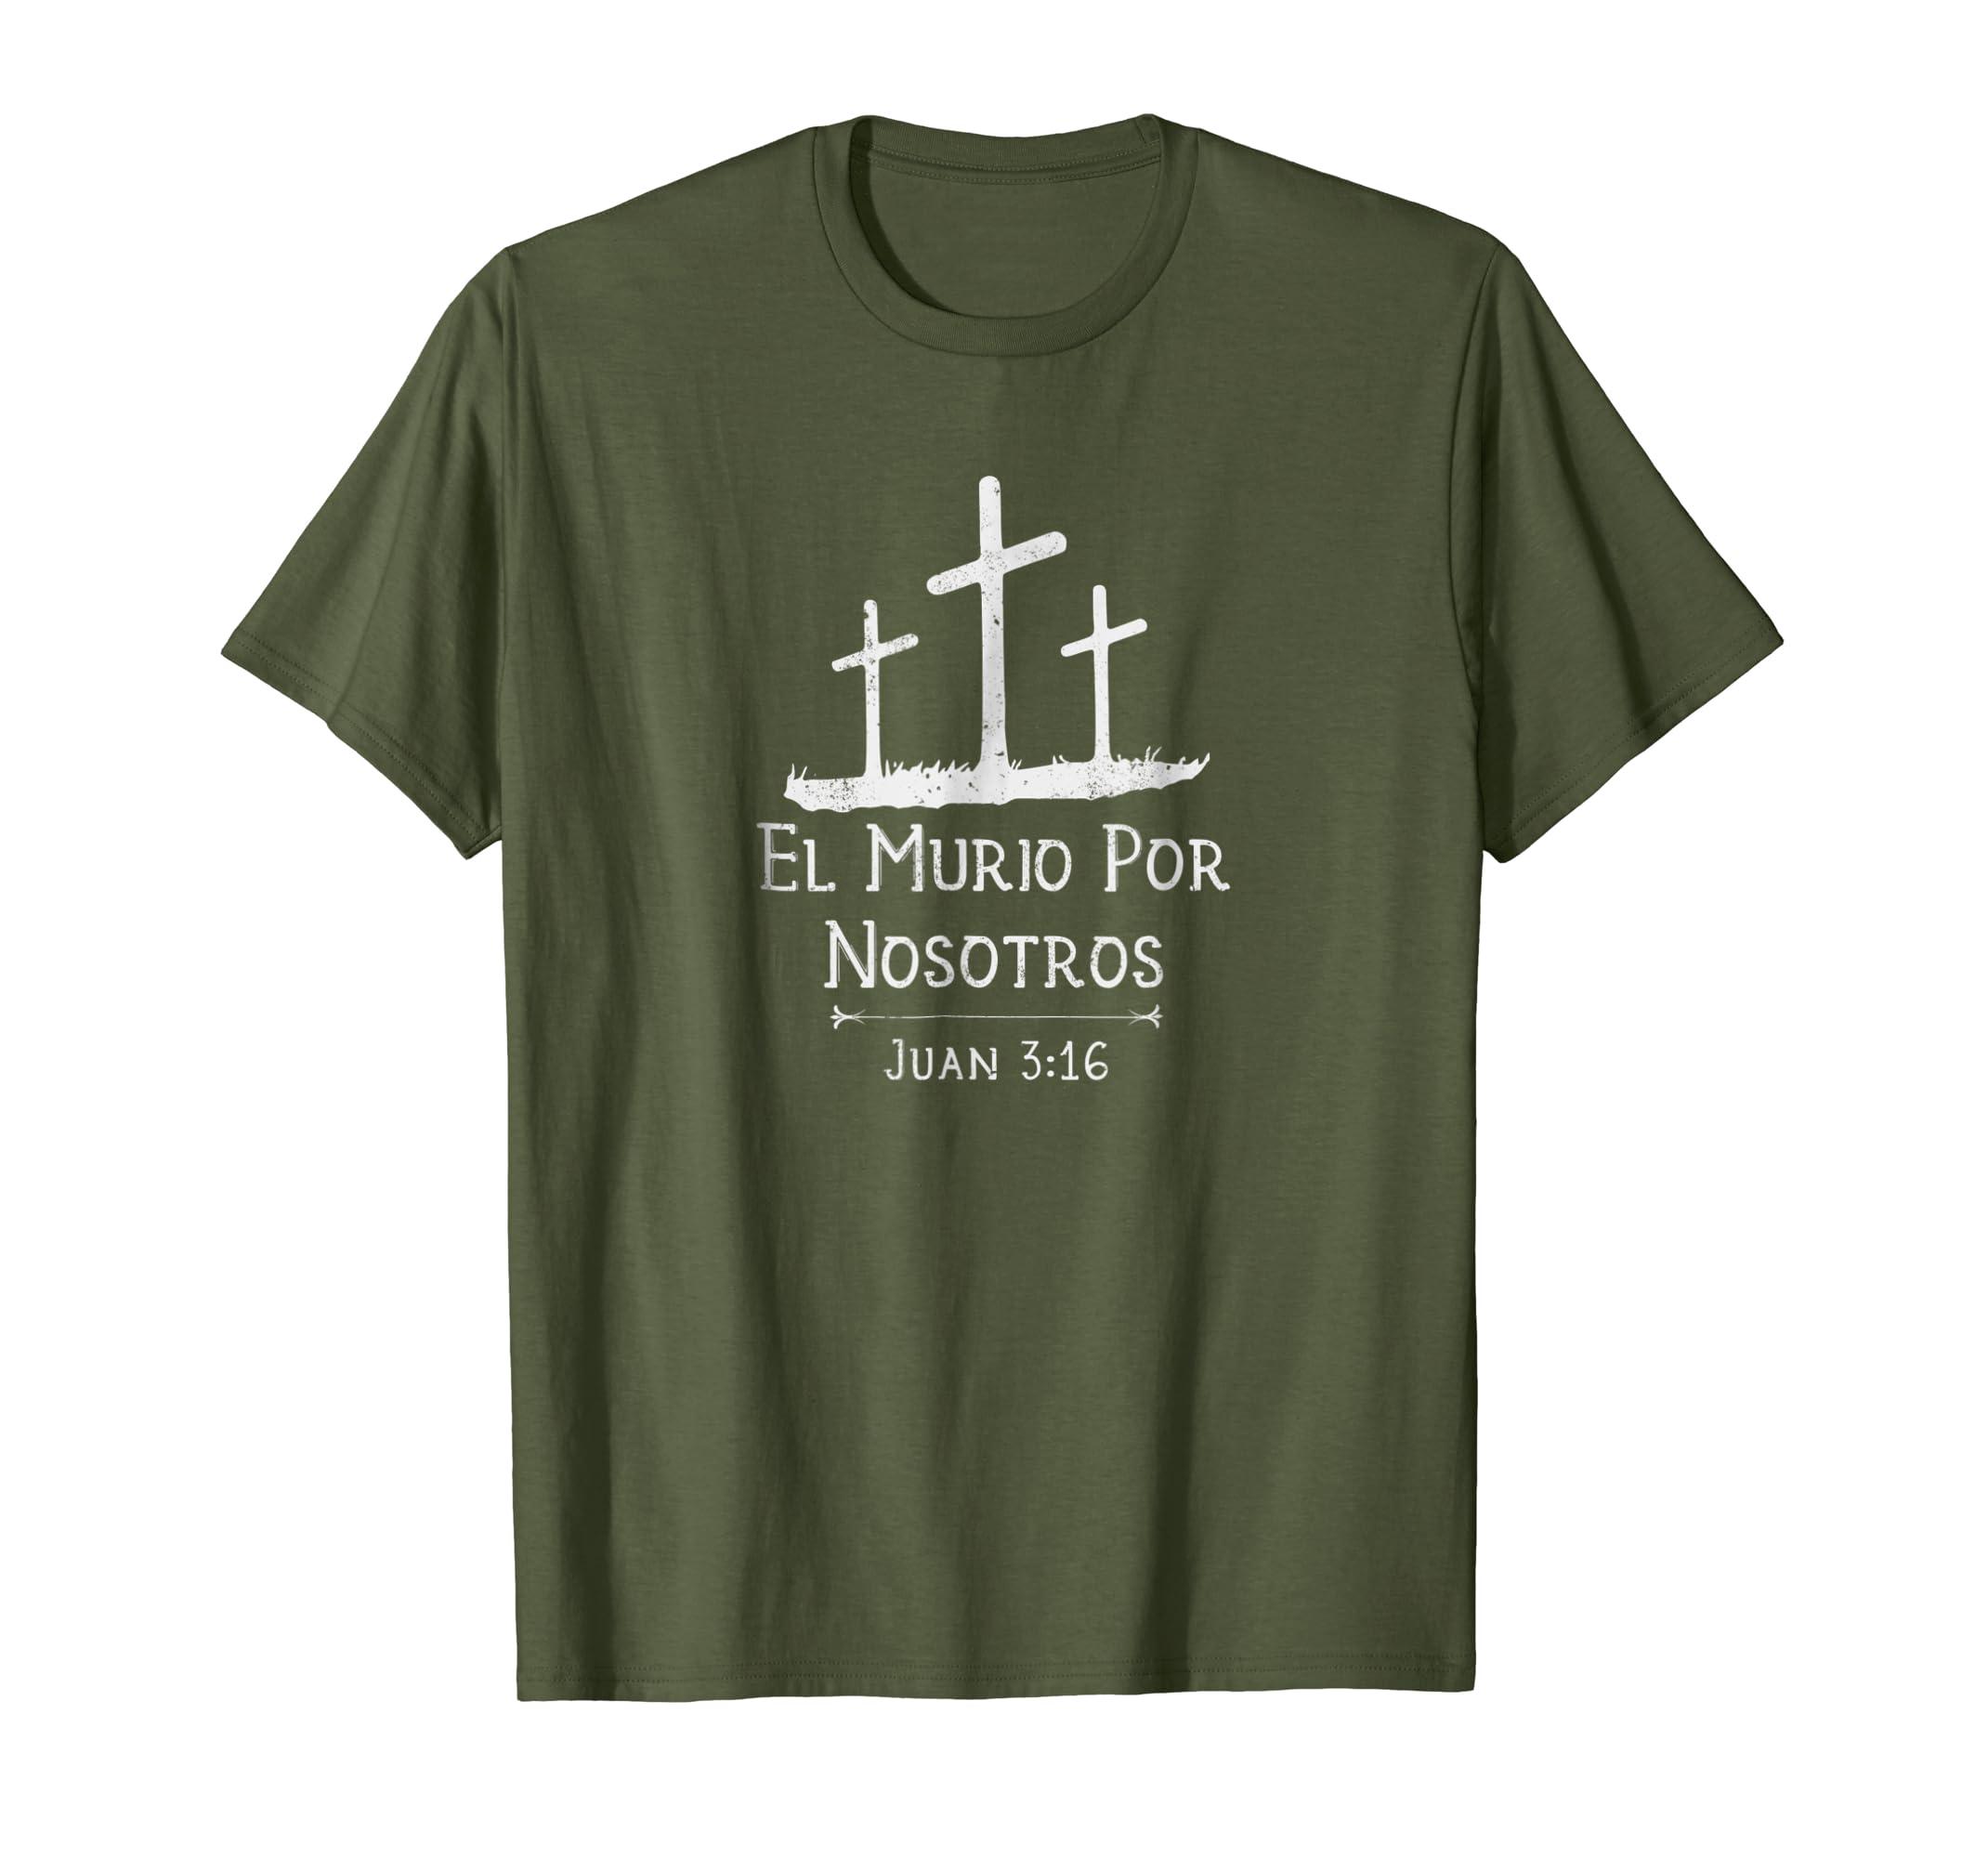 Amazon.com: Juan 3:16 Camisa | Spanish Christian Shirts for Cristianas: Clothing